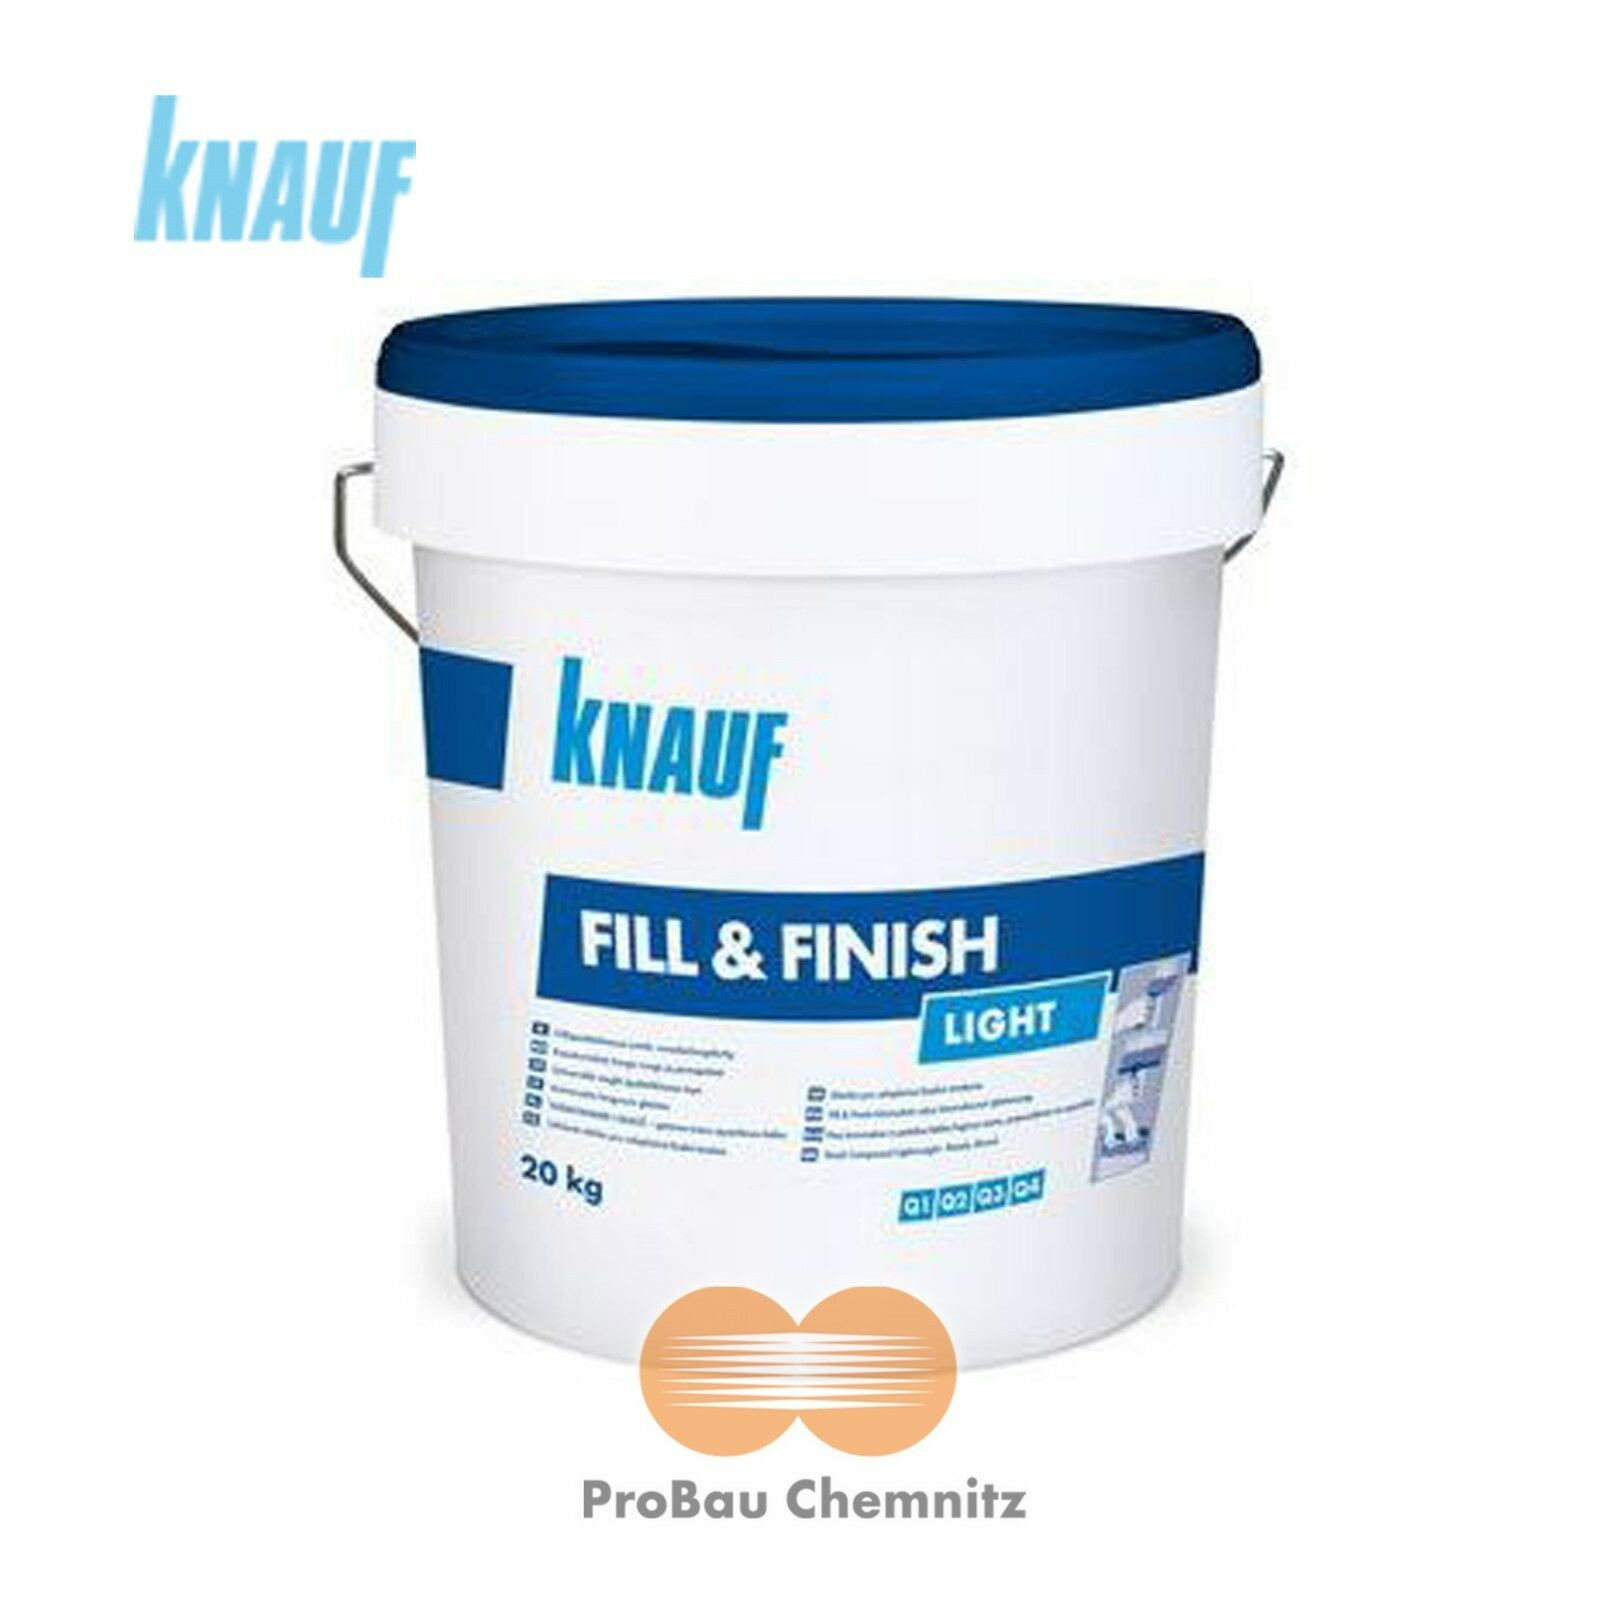 knauf sheetrock fill & finish light 20kg füllmasse